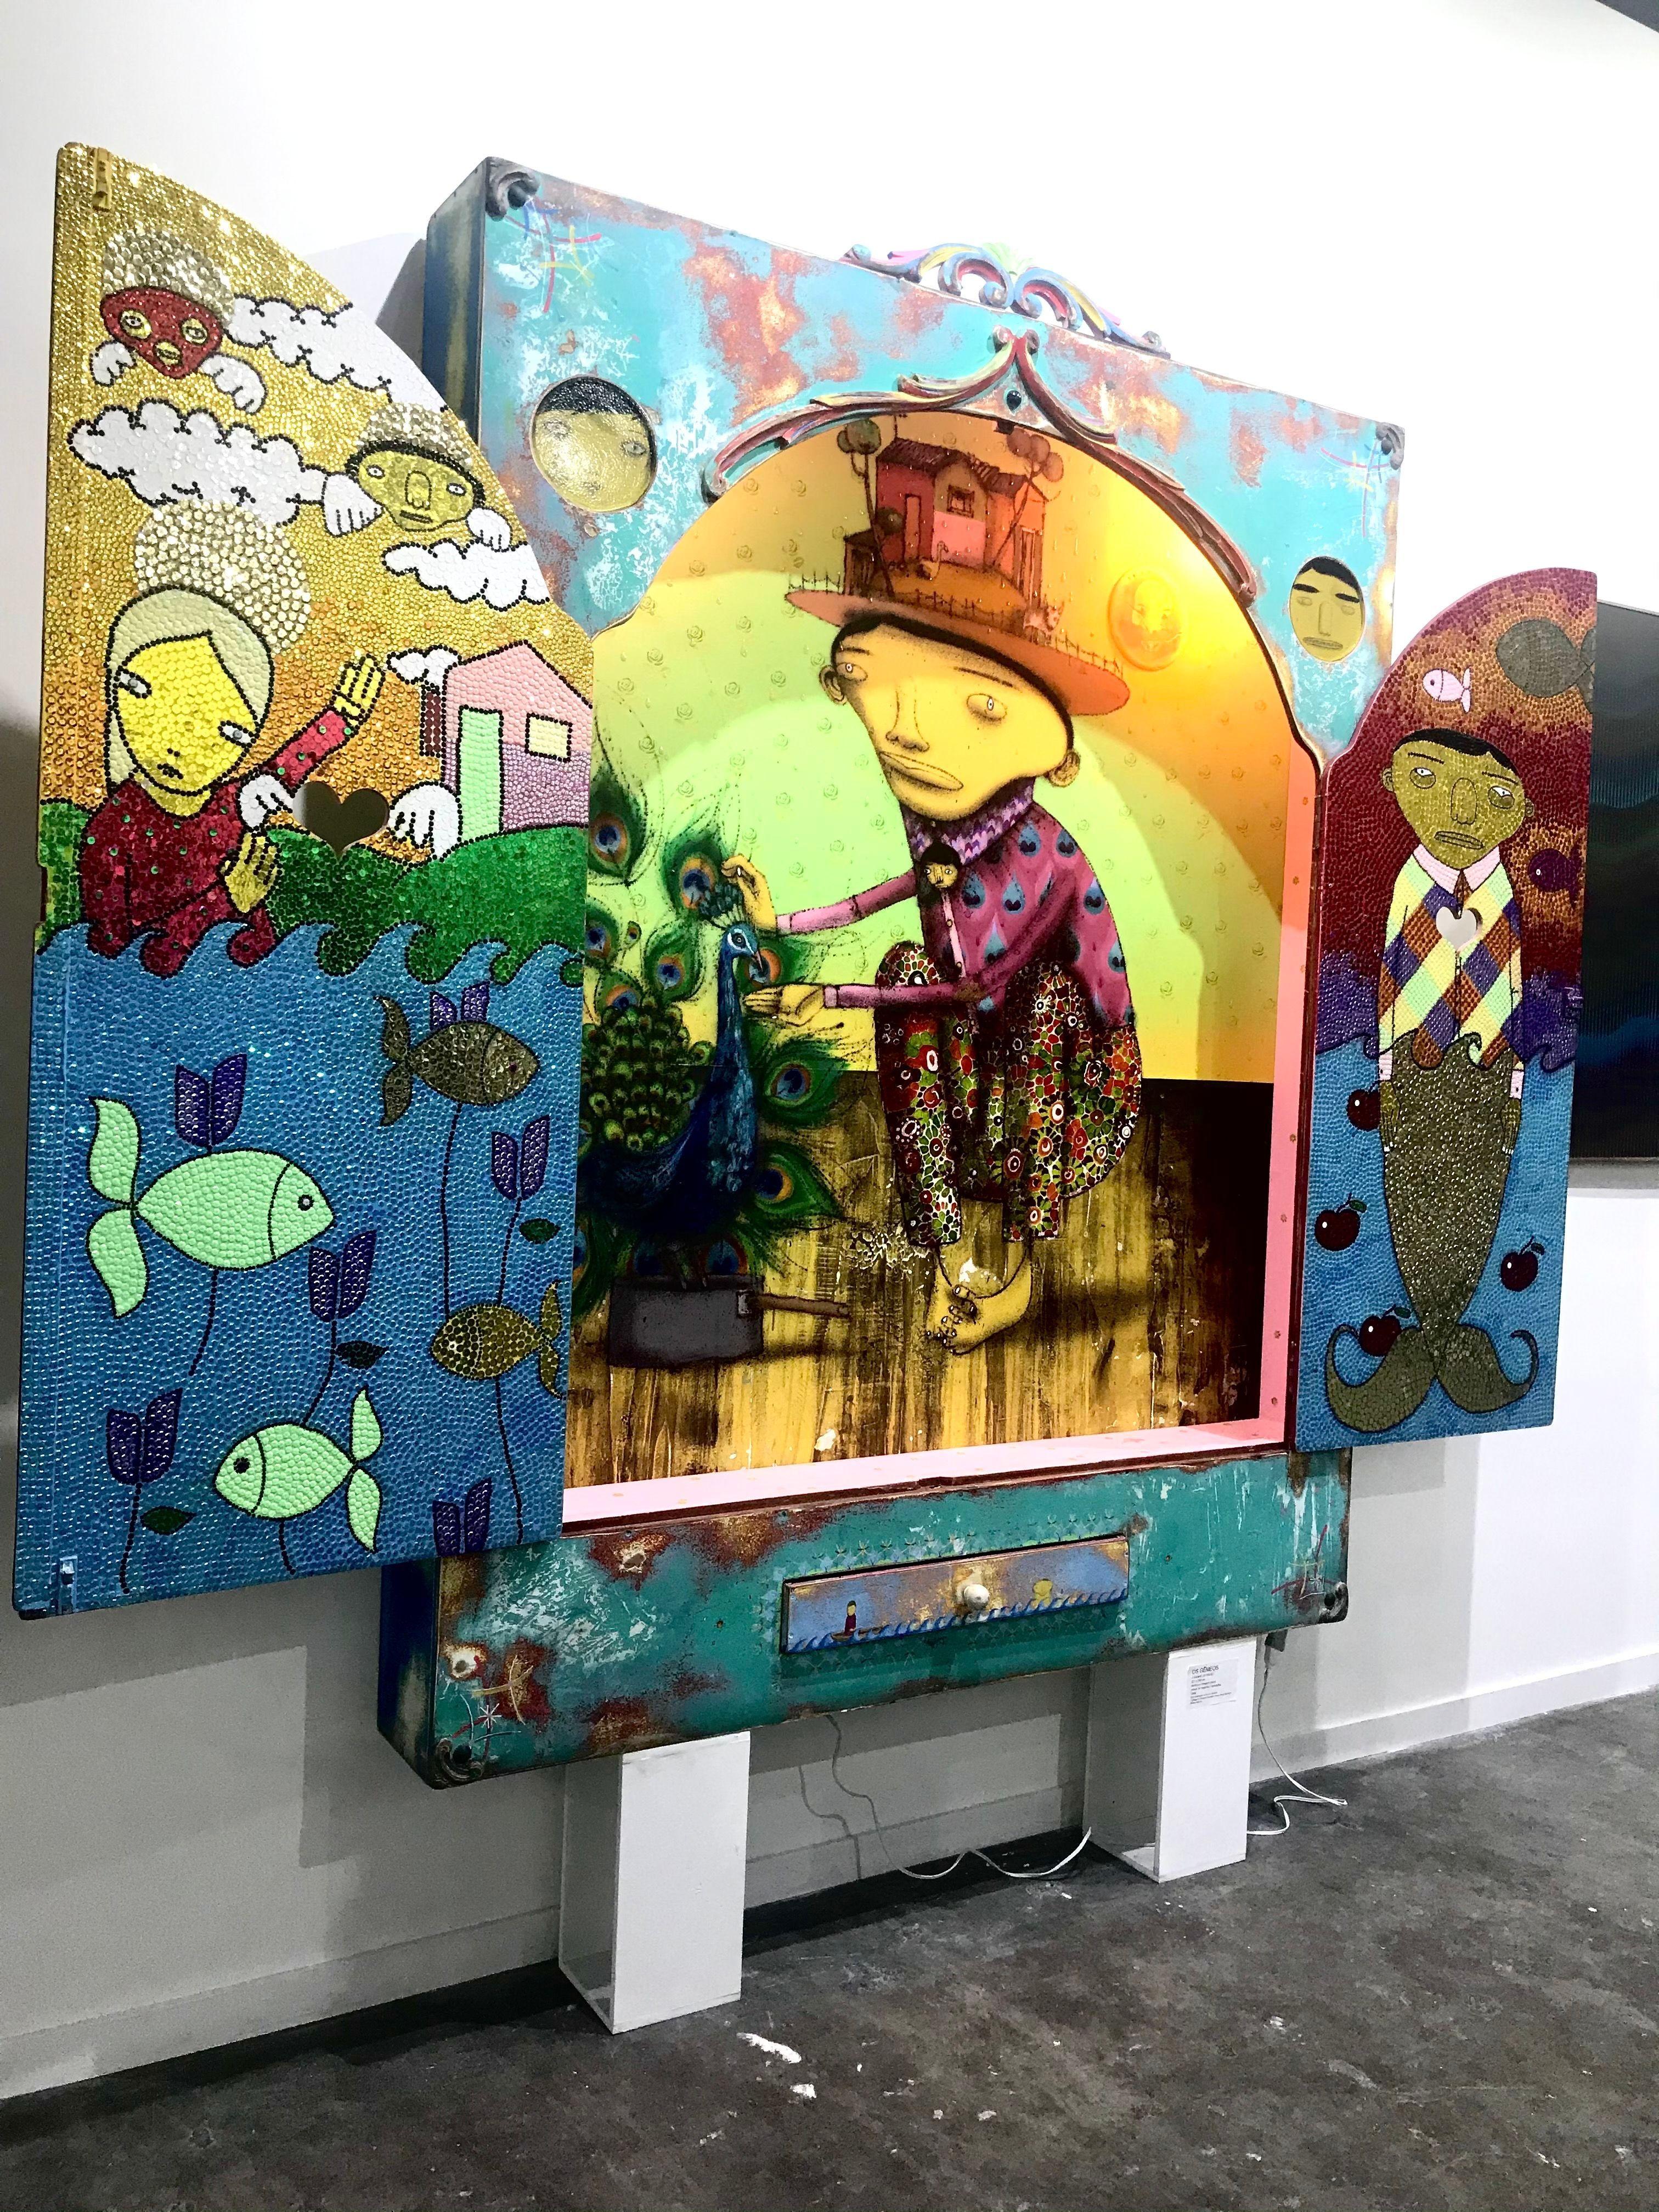 #osgemeos #graffiti #graffitiart . . . . . #urbex #streetshared #aov #weekly_feature #createexploretakeover #shotzdelight #mkexplore #gearednomad #rsa_streetview #contemporaryart #modern #sketch #sculpture #painting #contemporary #ink #draw #fineart #streetart #artgallery #ig_southamerica #unlimitedsouthamerica #loves_southamerica #southamericatravel #southamericatrip #igerssouthamerica #iphoneography #iphoneonly #iphonesia #iphoneography #focalmarked